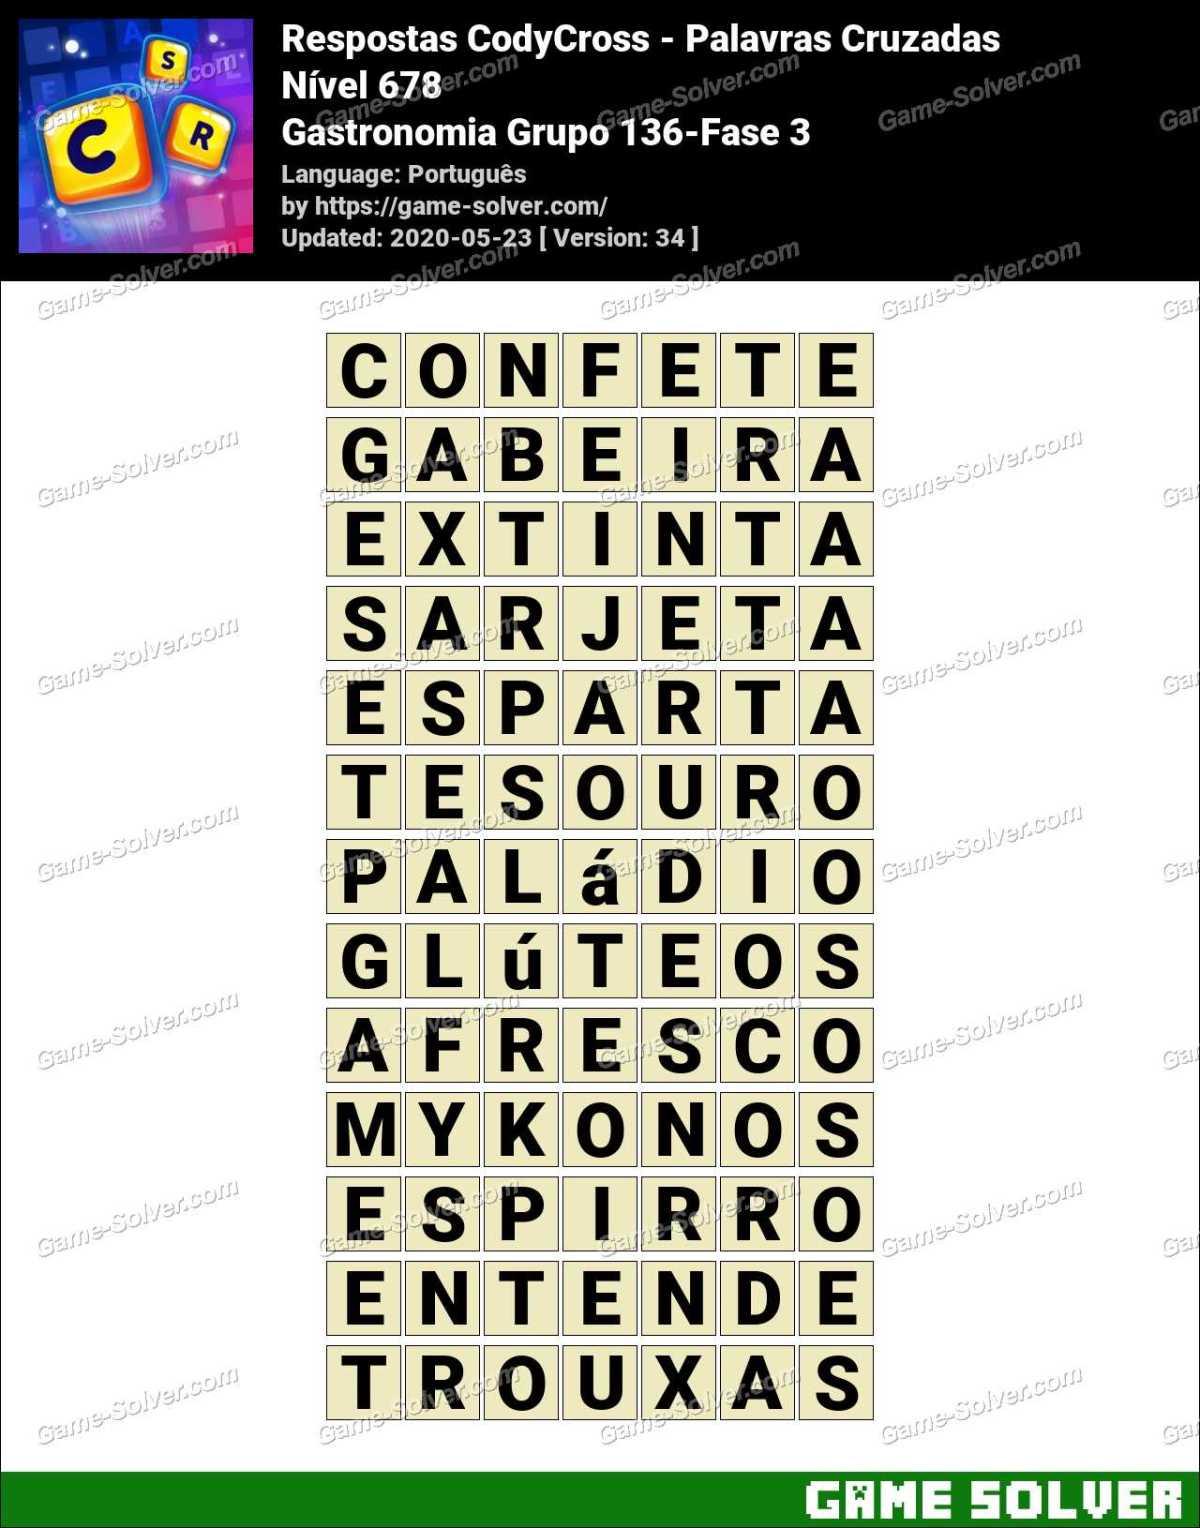 Respostas CodyCross Gastronomia Grupo 136-Fase 3